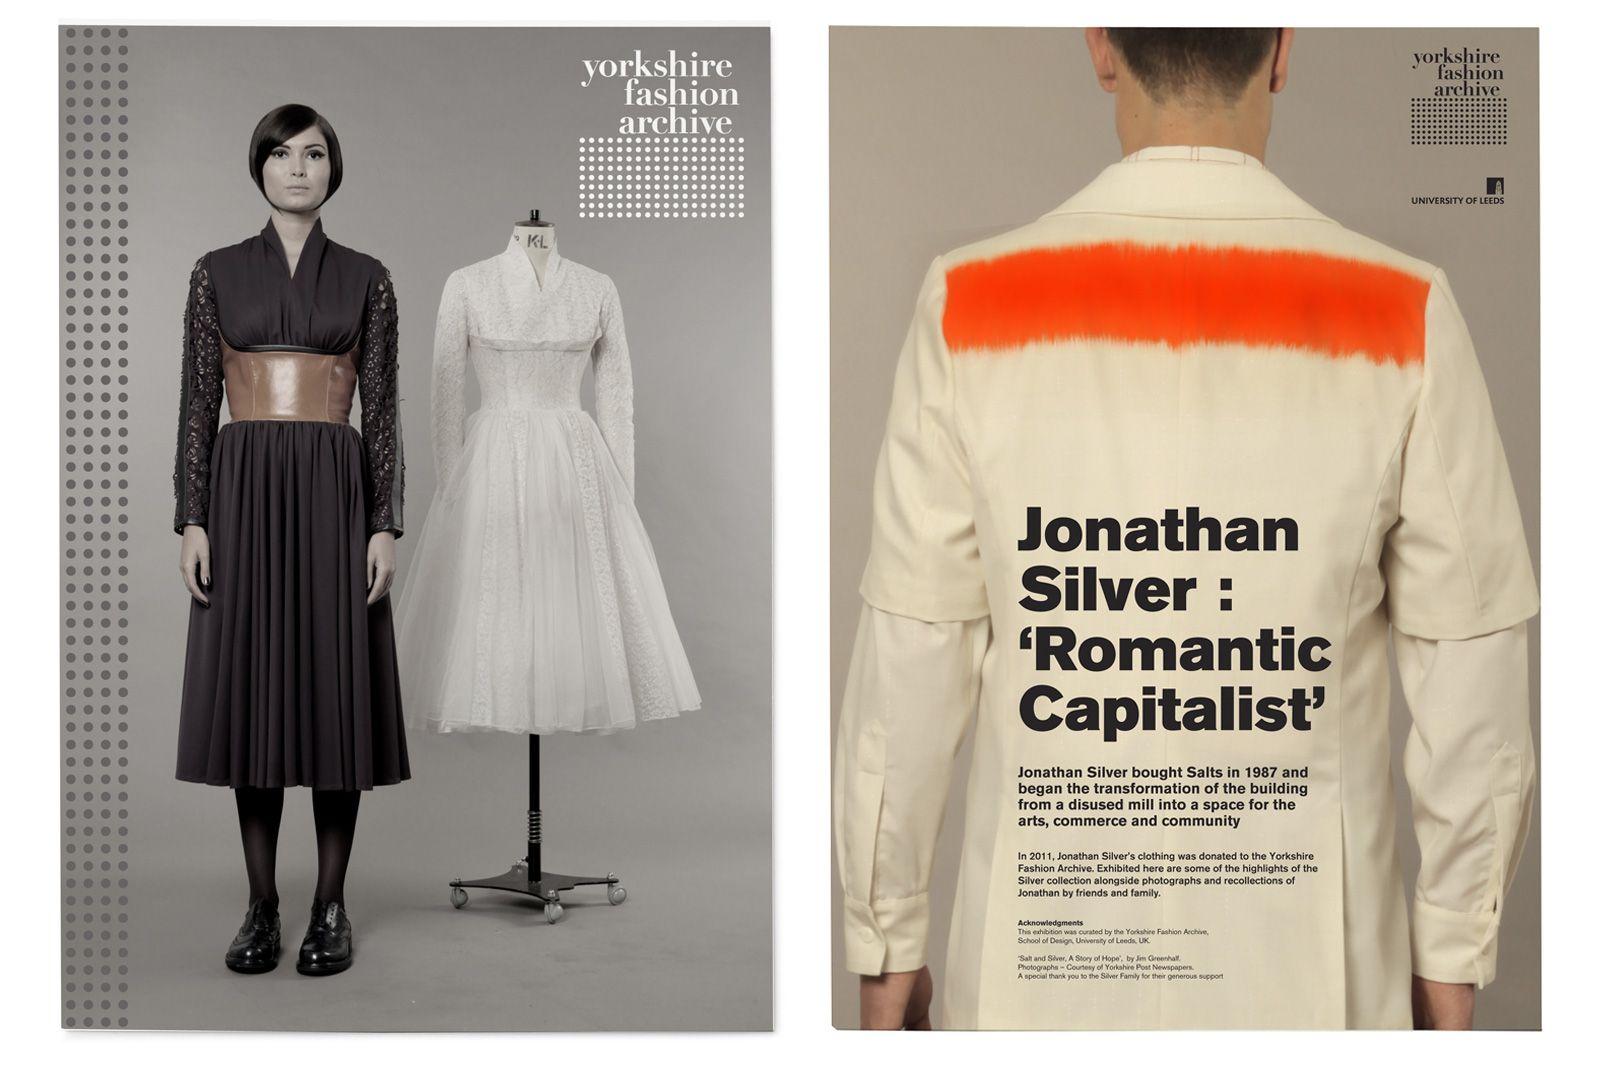 Yorkshire Fashion Archive University Of Leeds Trebleseven Fashion Yorkshire Leeds